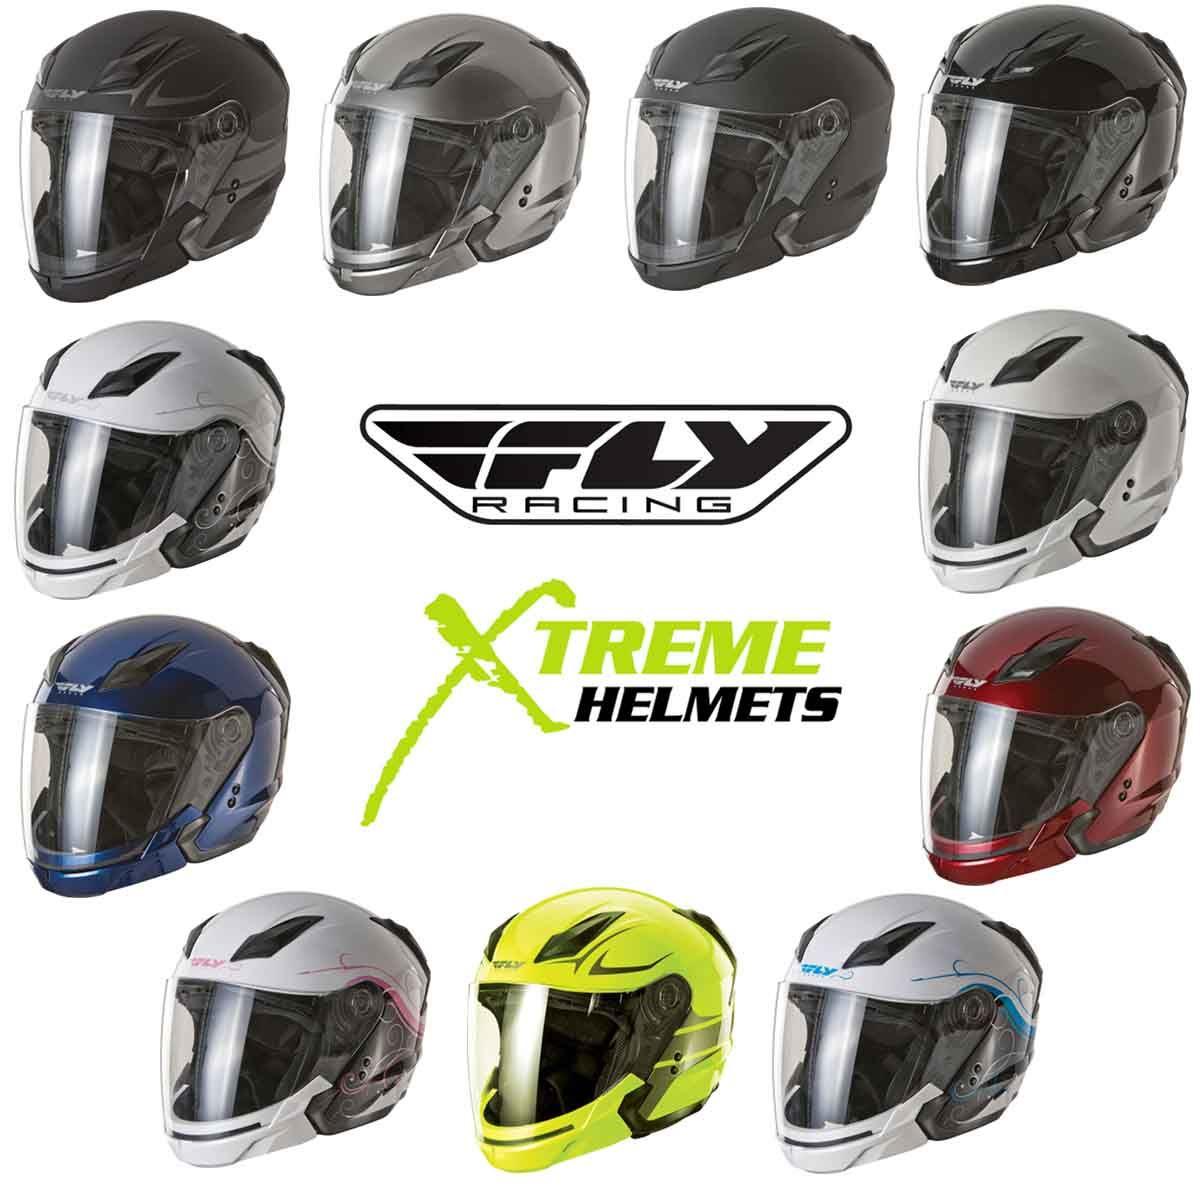 White//Silver FLY Tourist Cirrus Modular Motorcycle Helmet XL X-Large